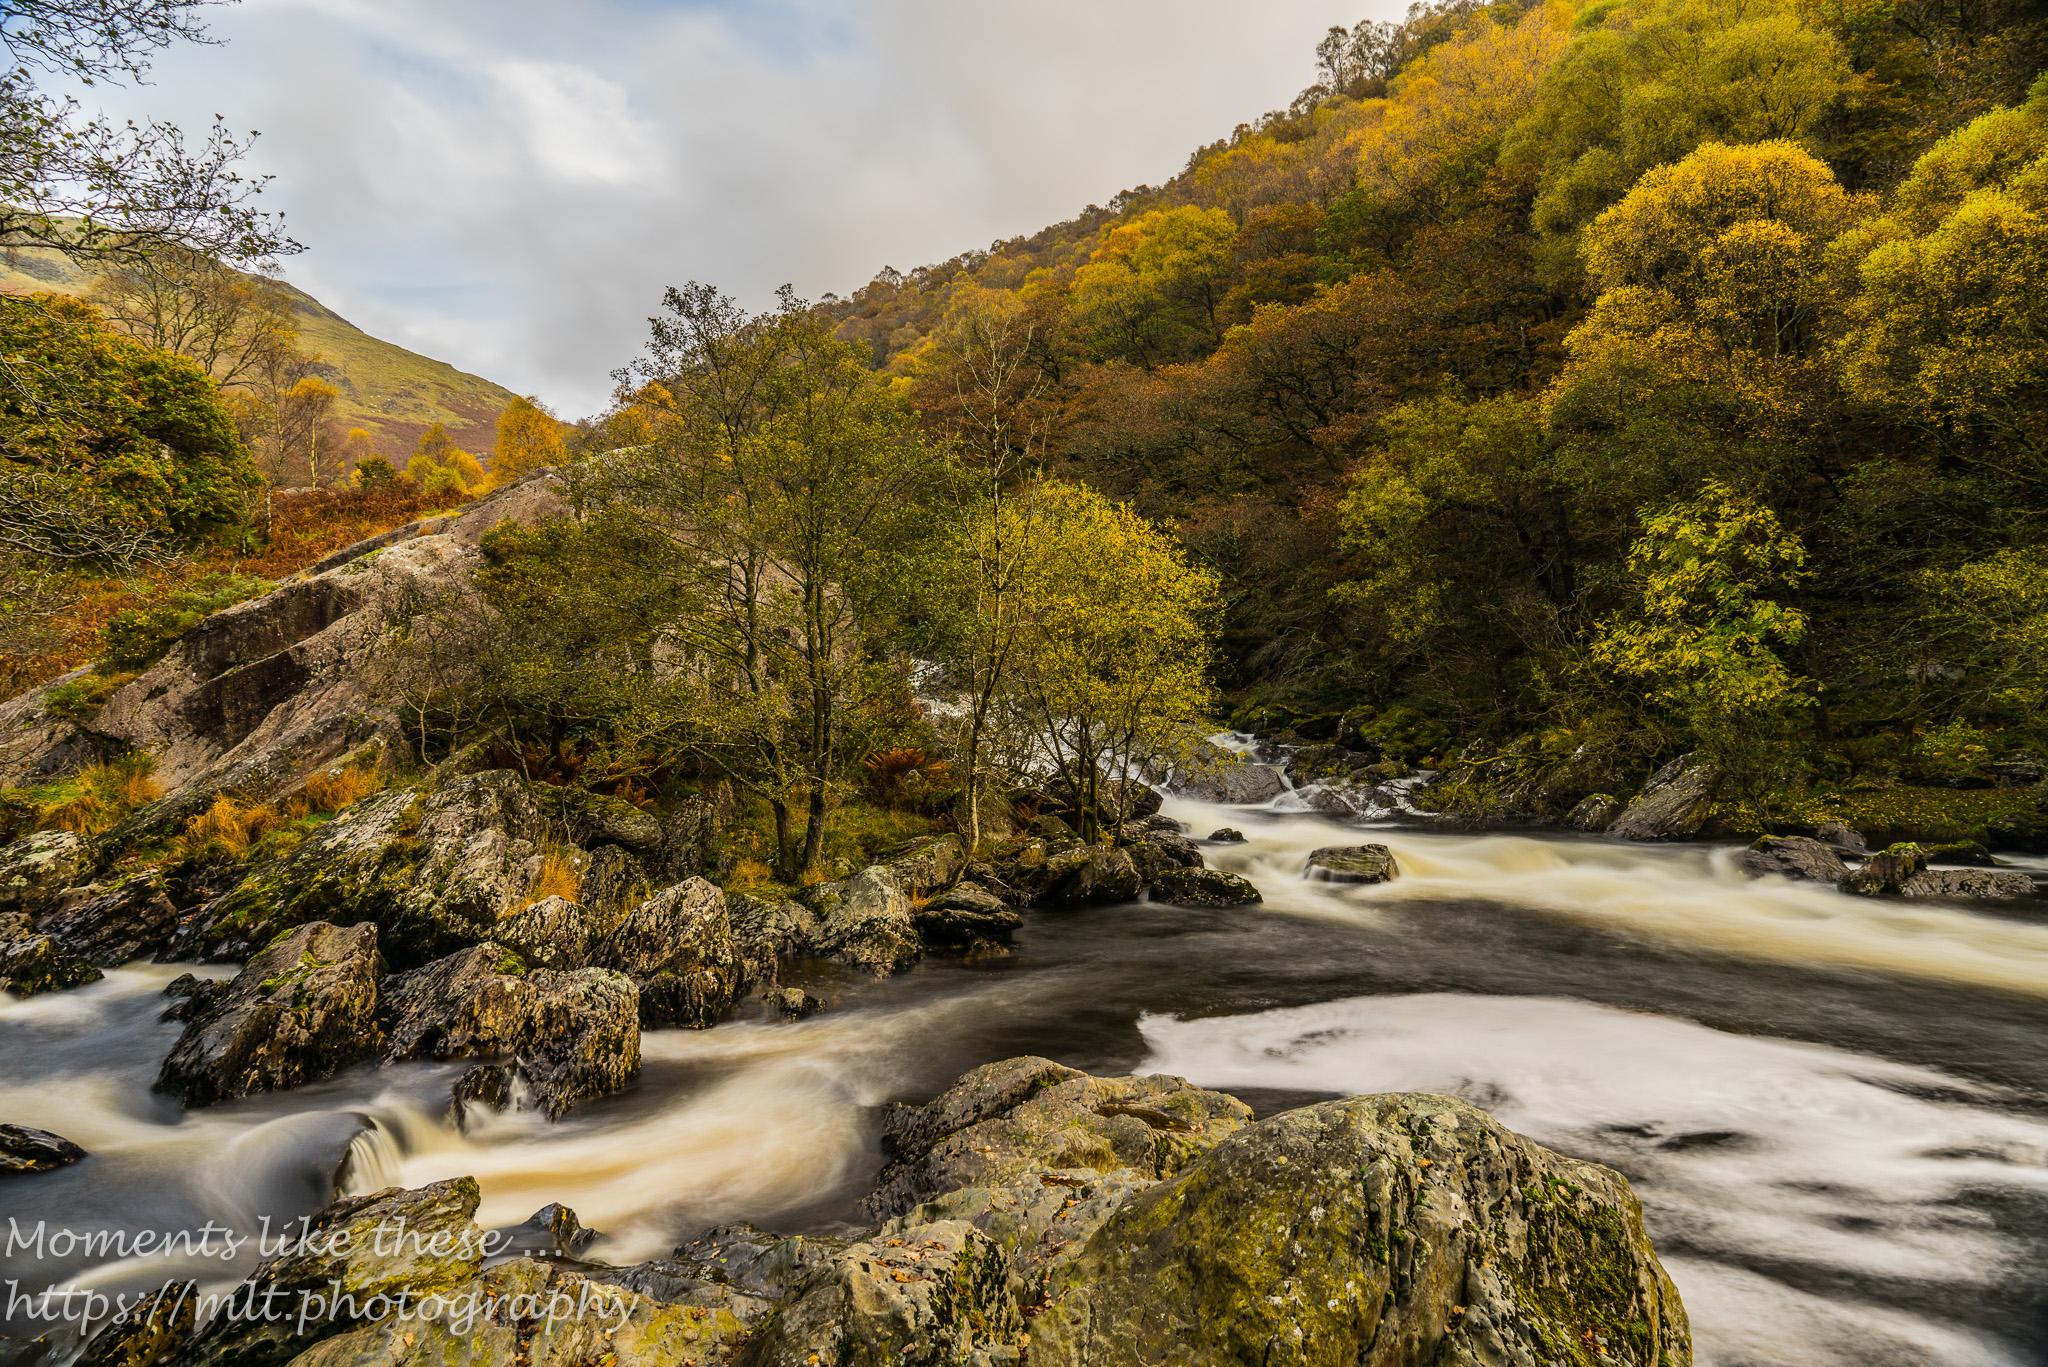 Afon Doethie meets the Afon Tywi near Dinas Rock